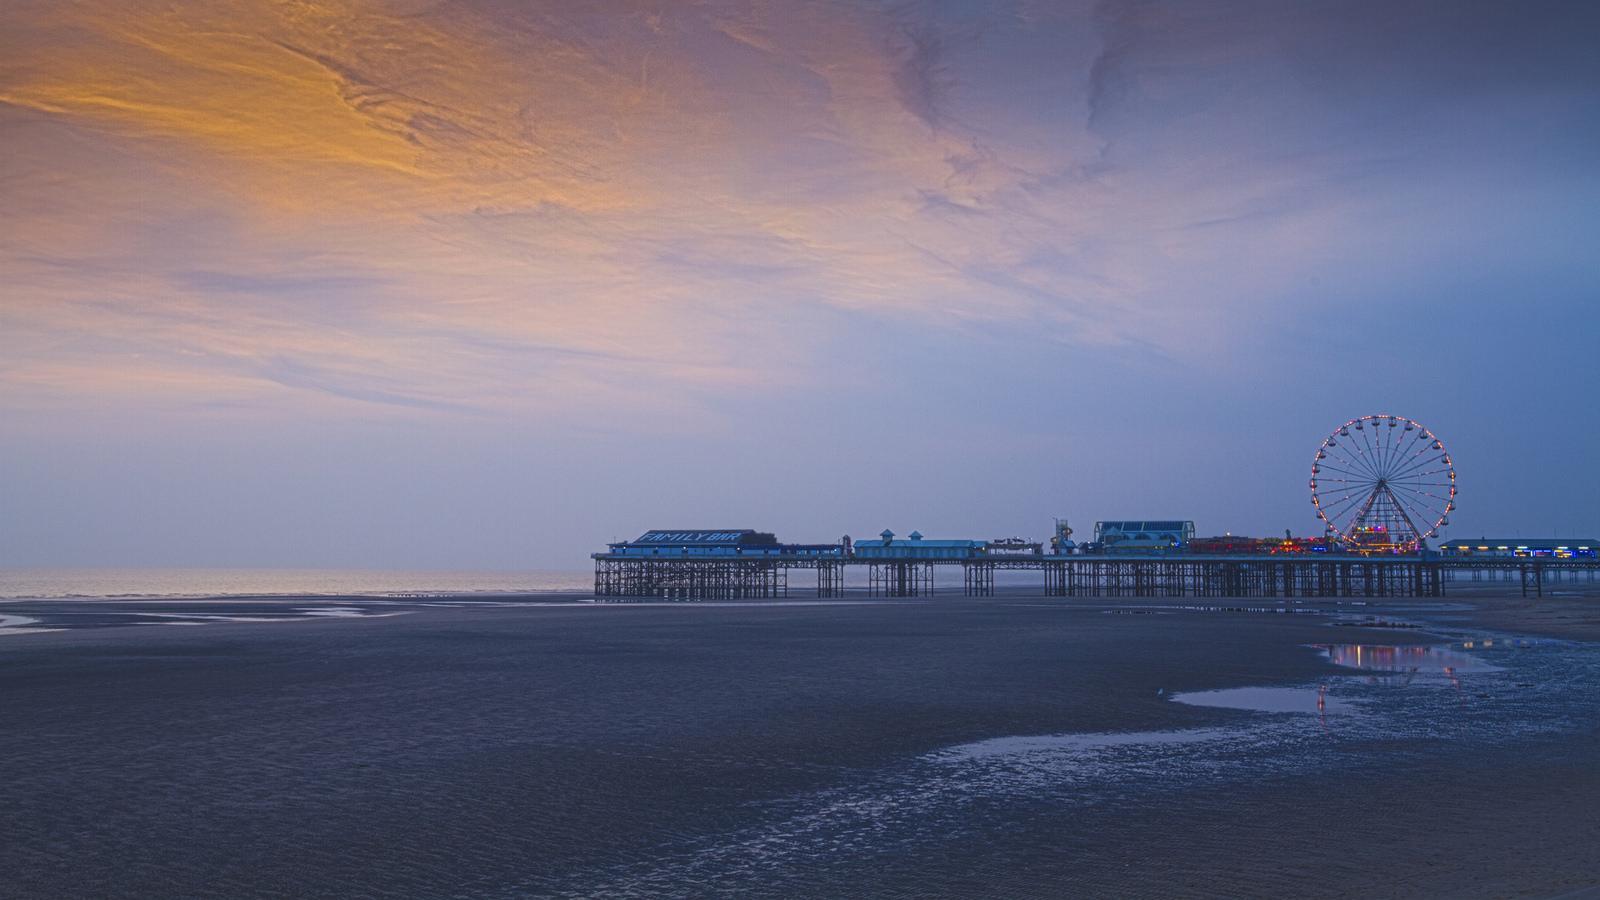 Blackpool Central Pier Sunset HD Wallpaper